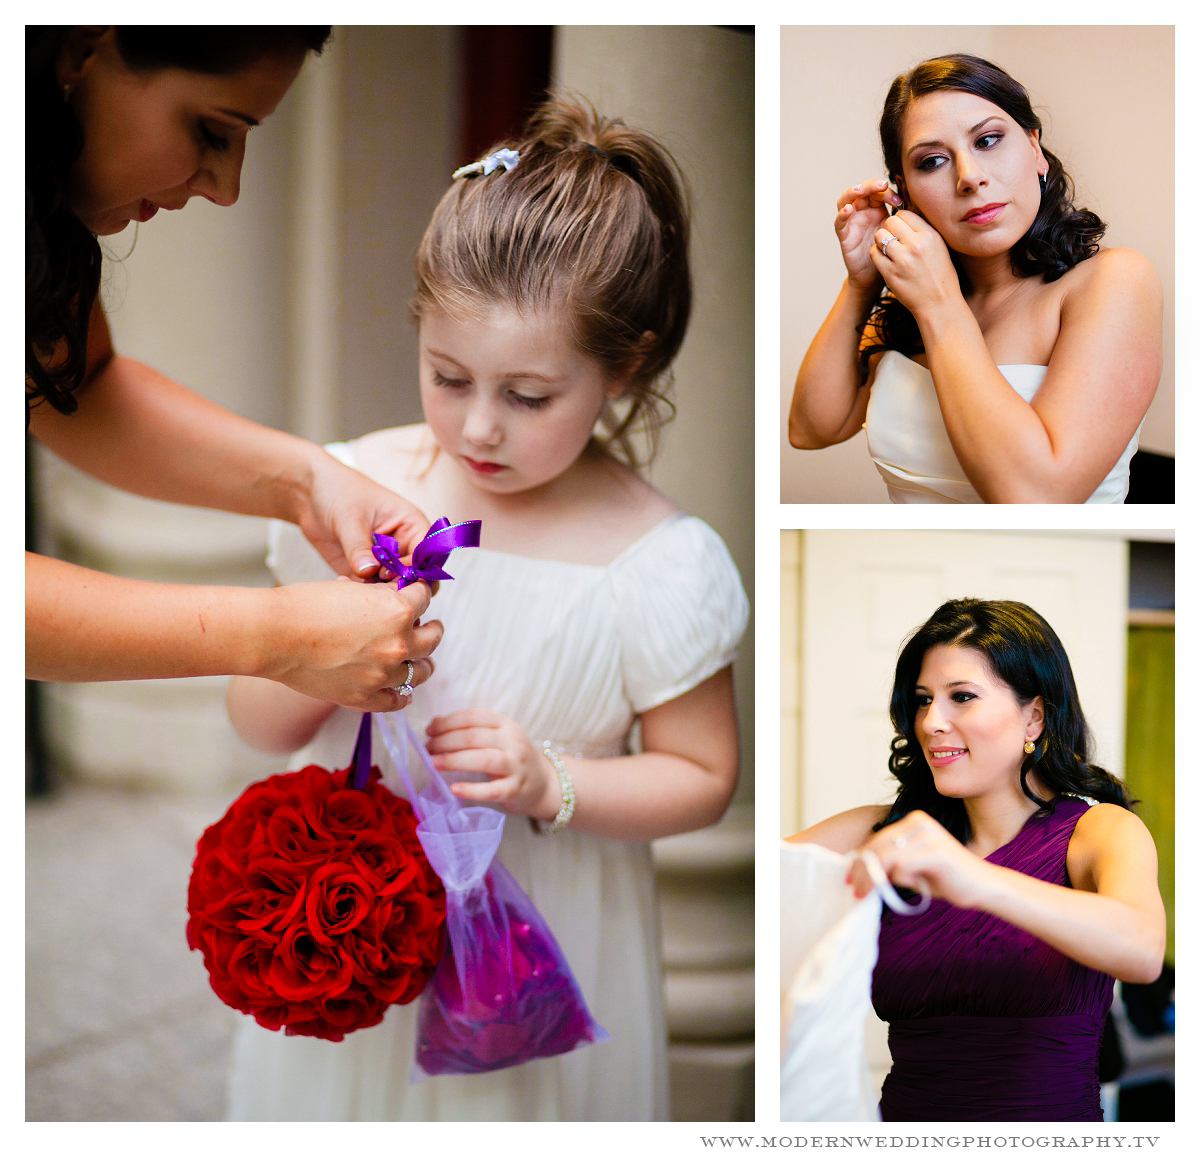 Modern Wedding Photography 0118 .jpg